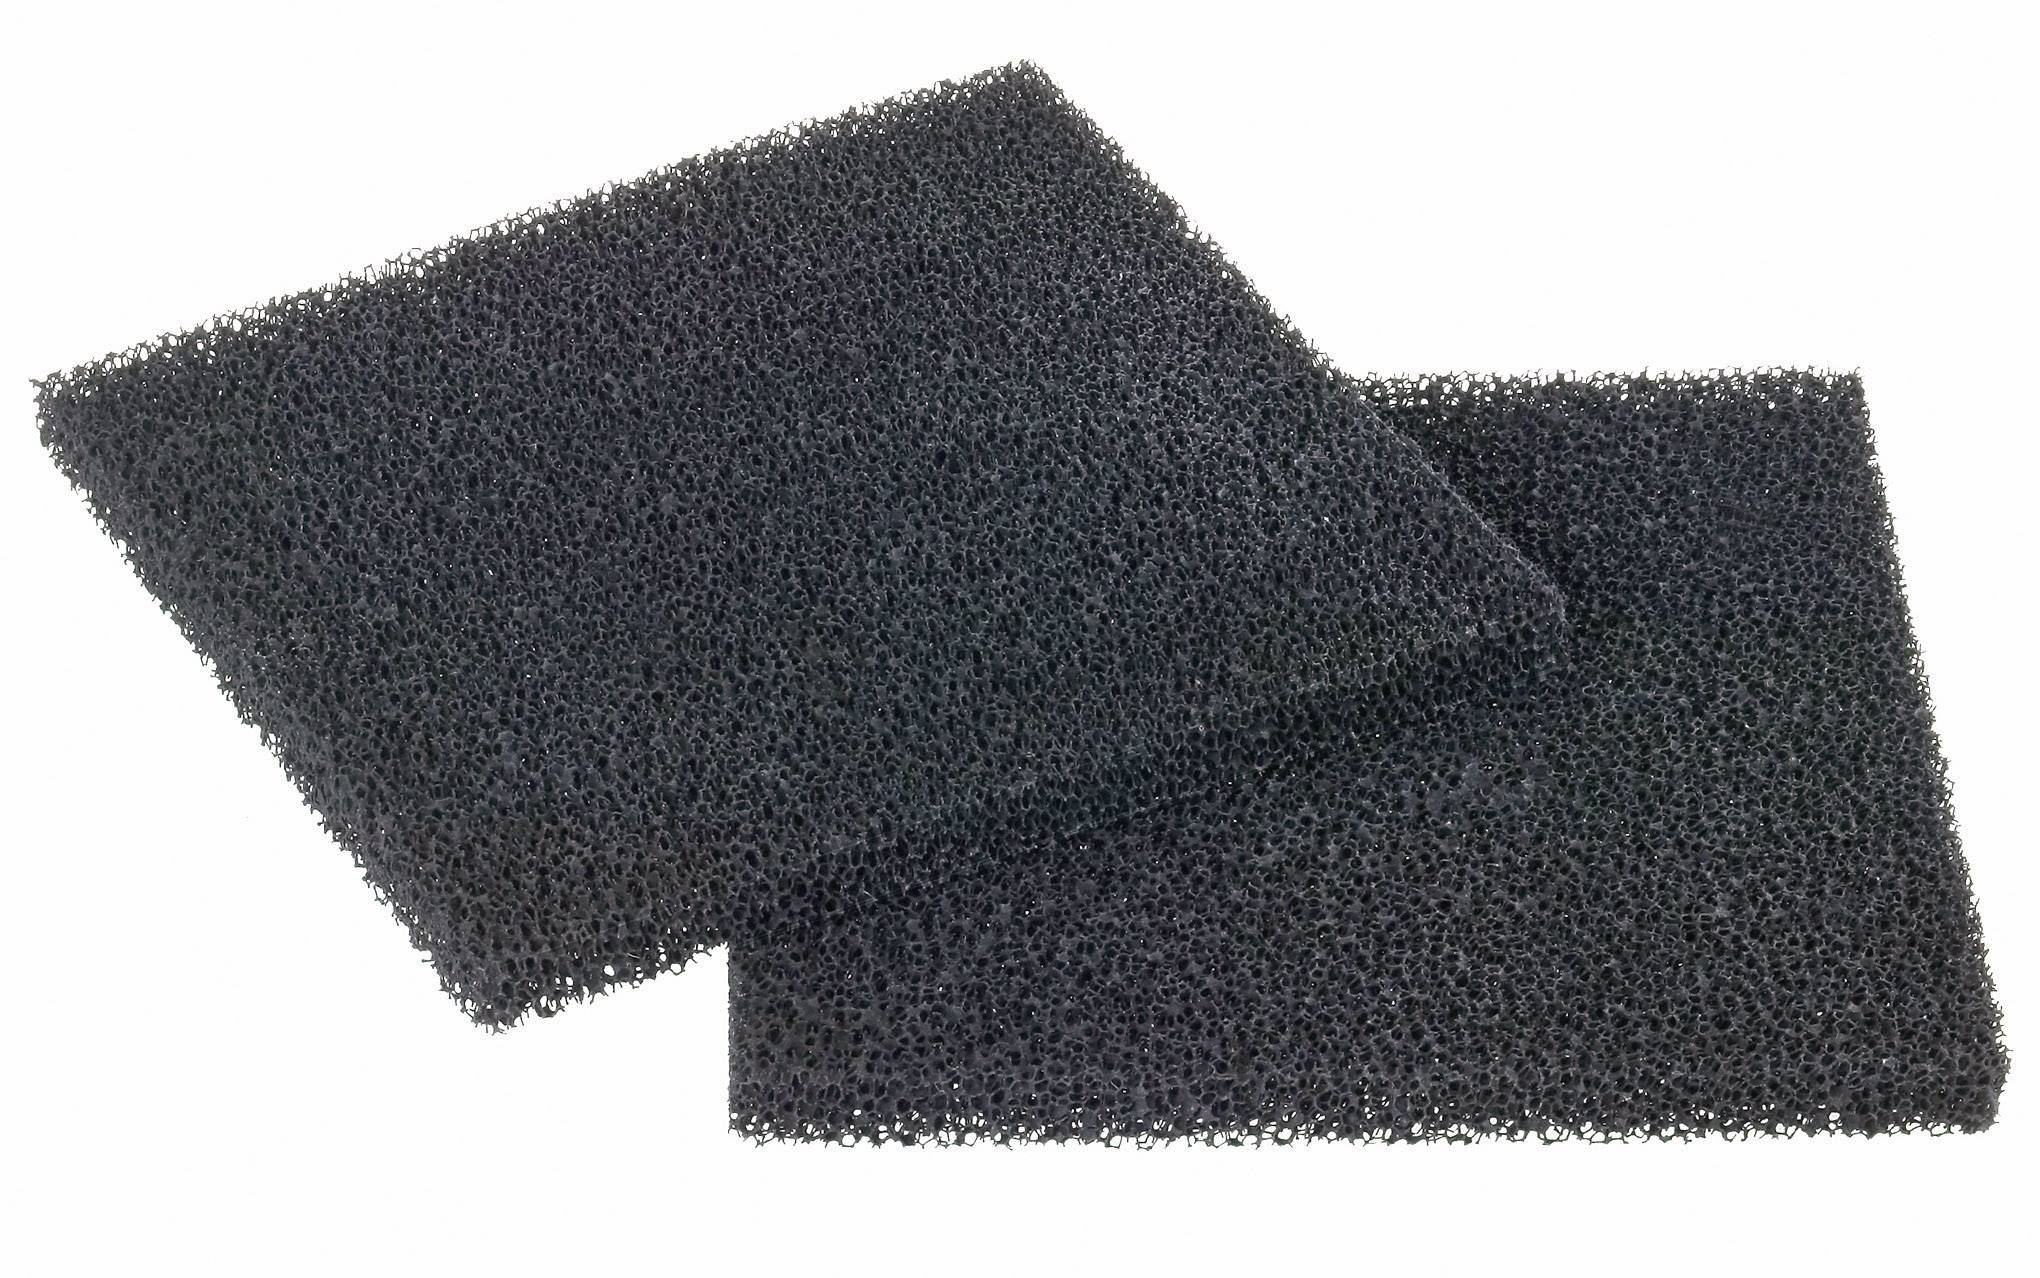 Höchste dunstabzug filter gedanke aeenebahai